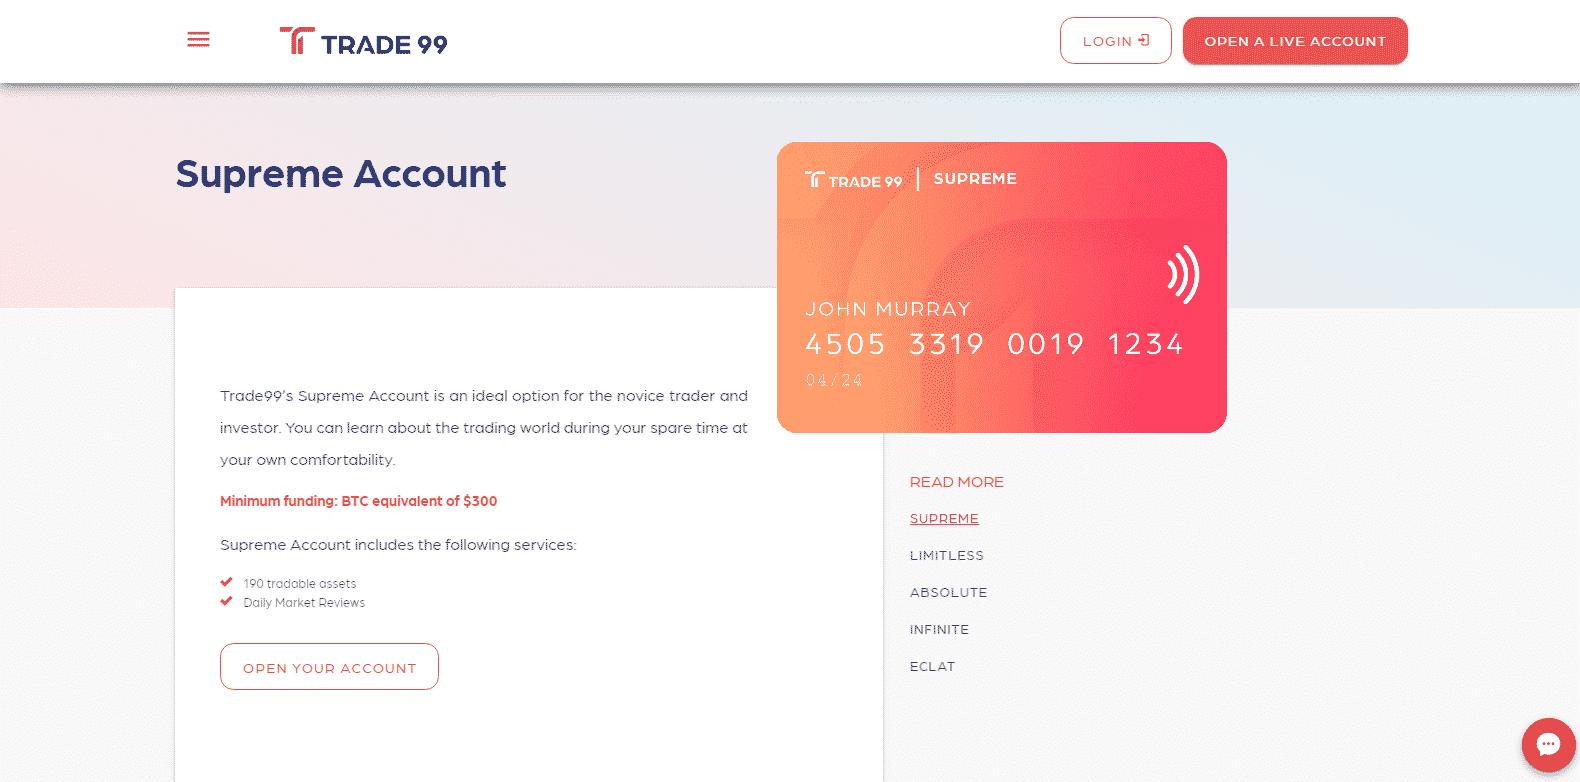 Trade99 - Trading Account